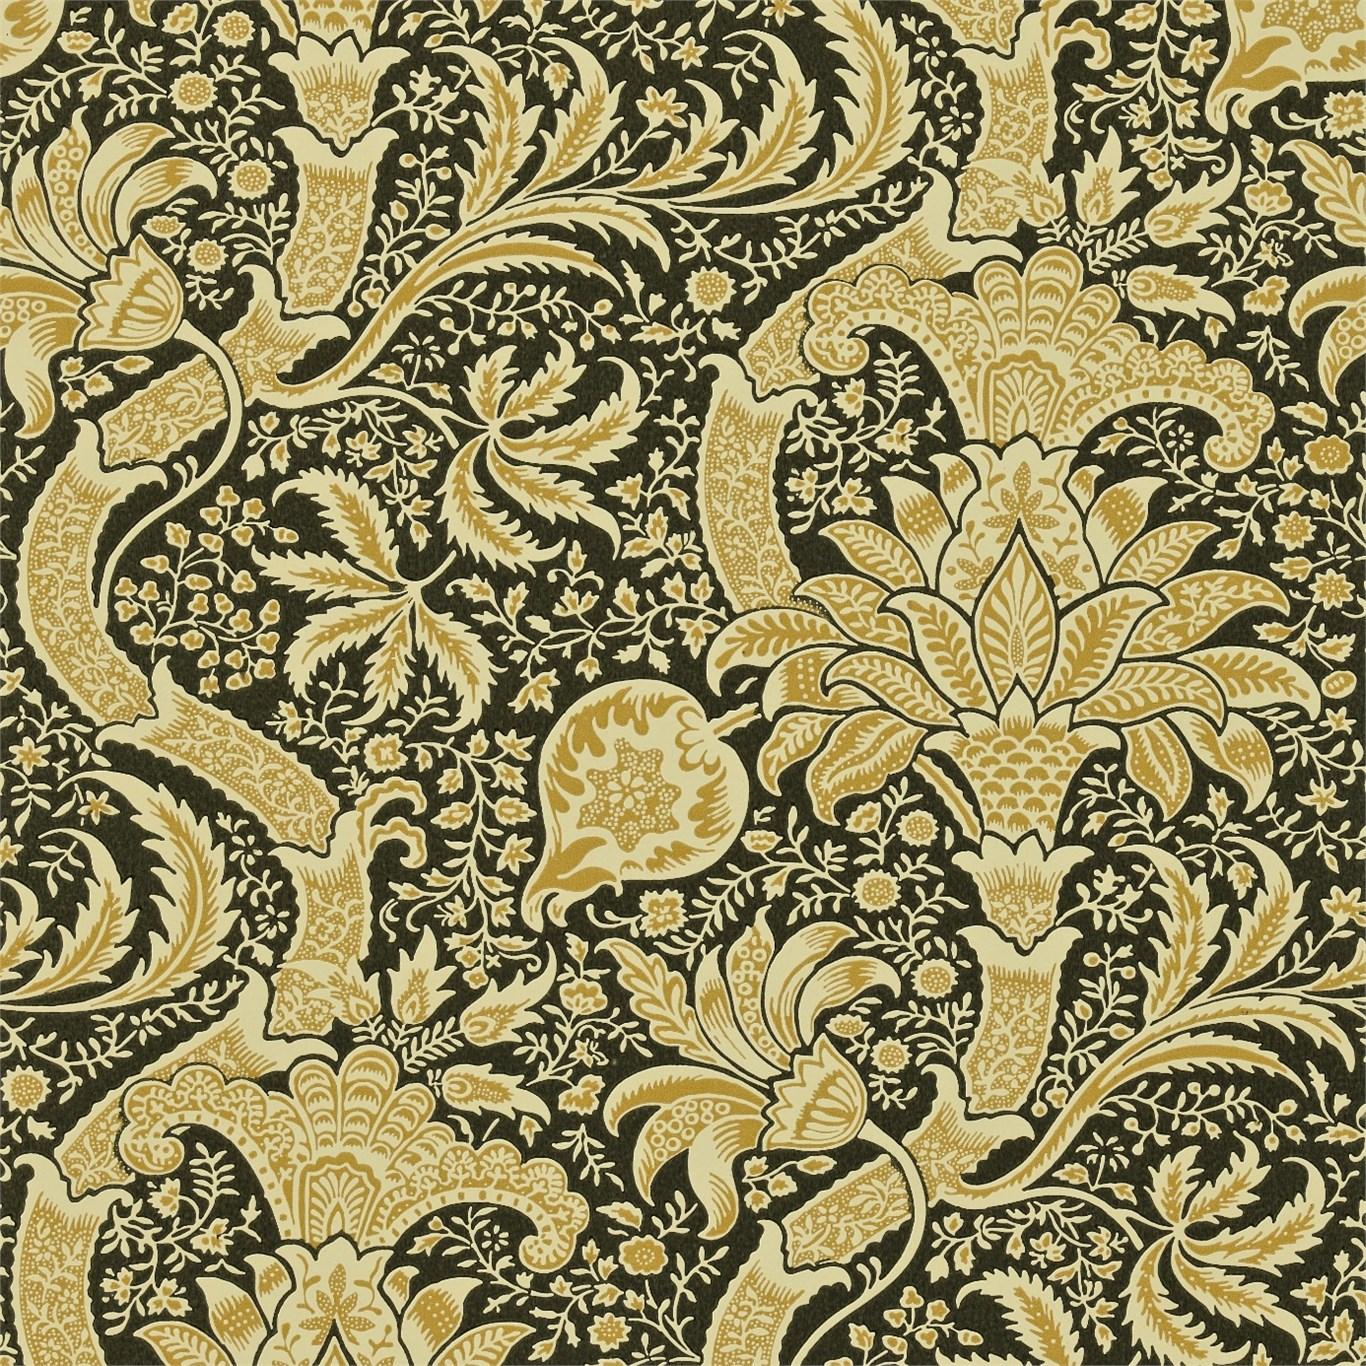 william morris wallpaper chameleon collection